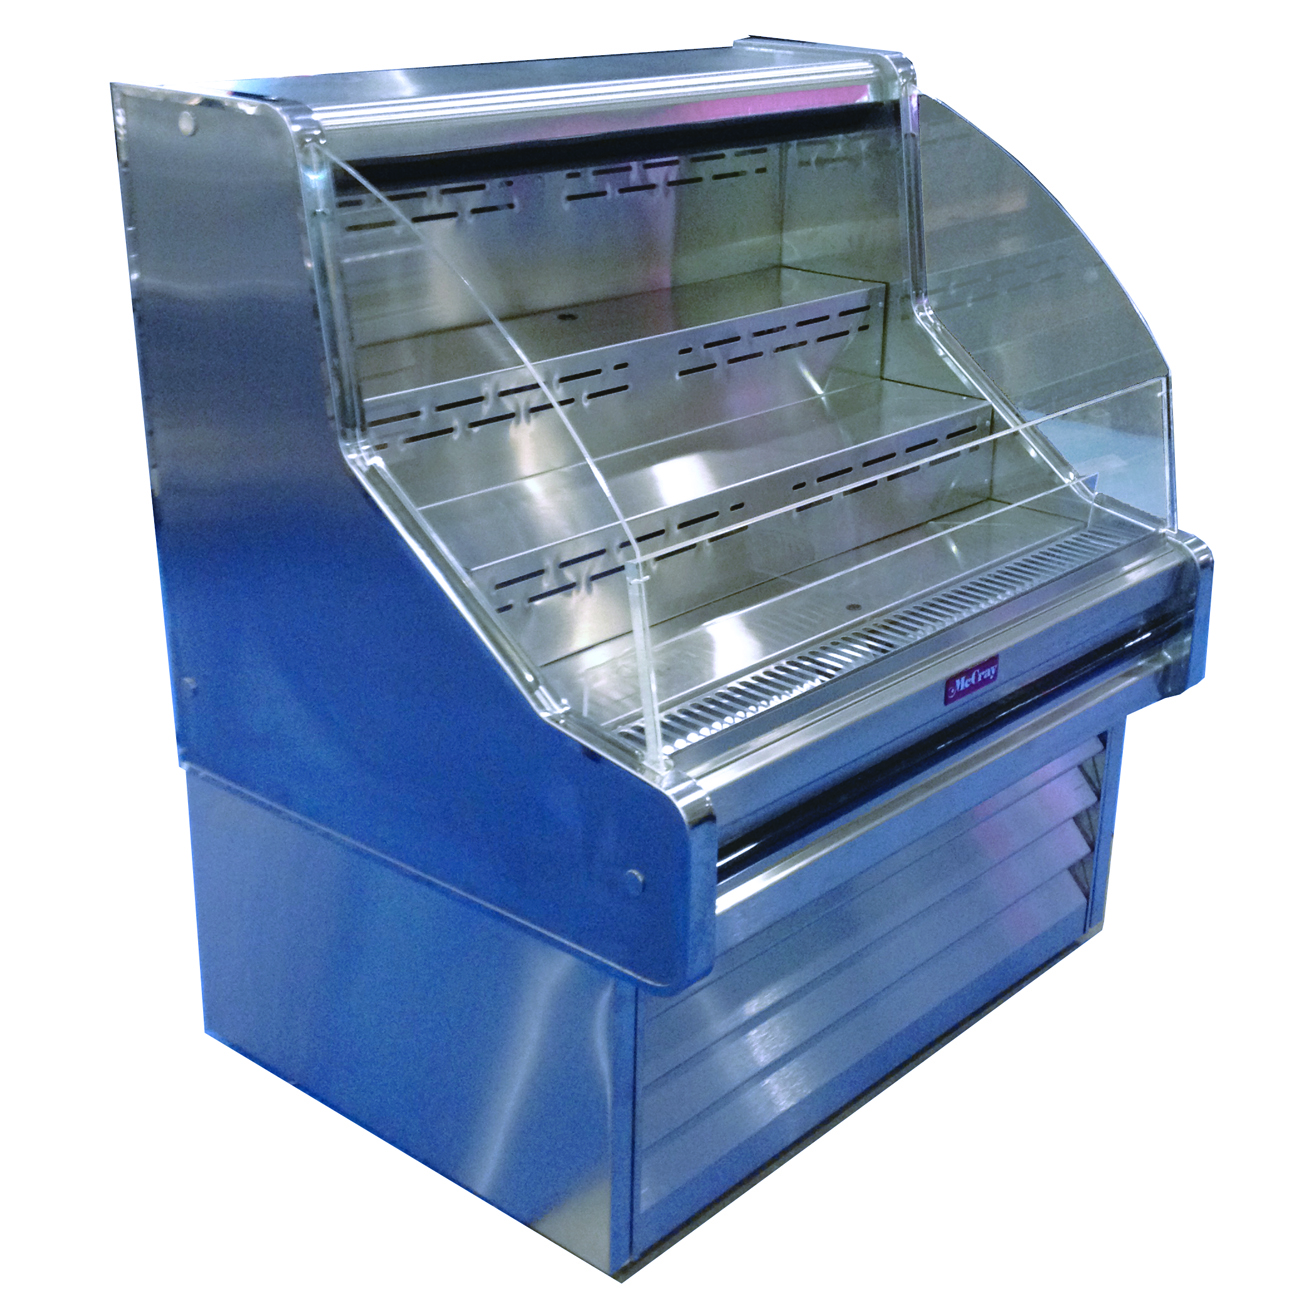 Howard-McCray SC-OS30E-6C-S merchandiser, open refrigerated display